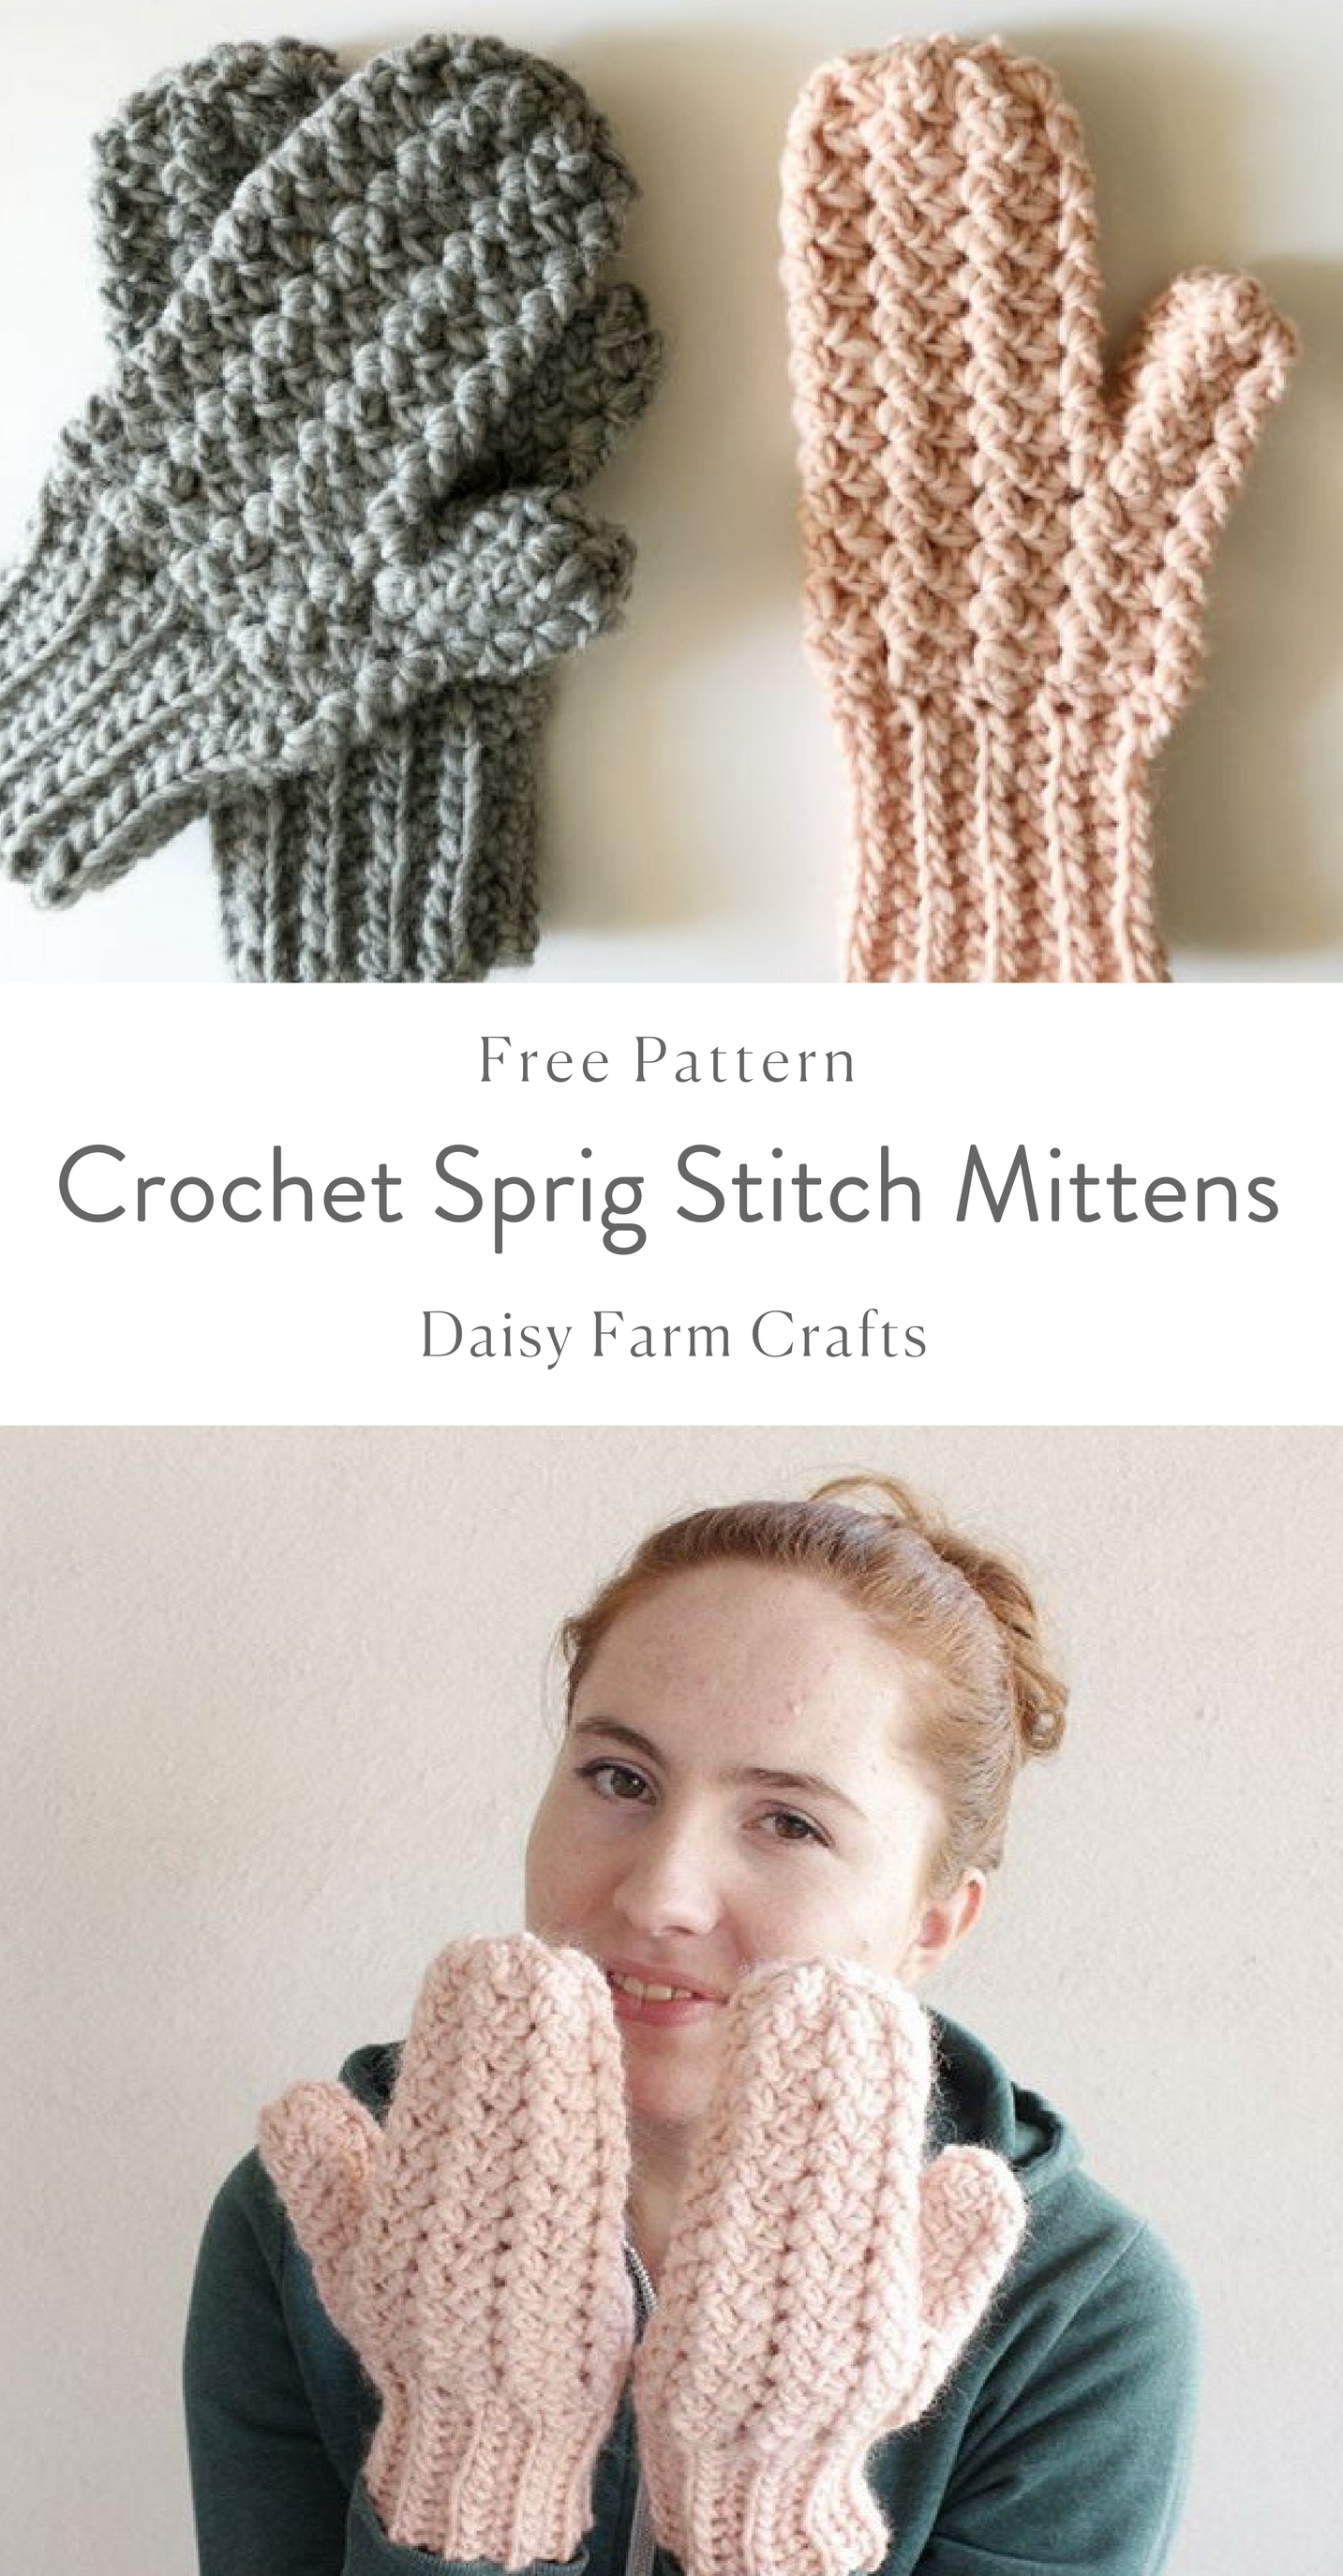 Crochet Sprig Stitch MIttens - Free Pattern | Crochet | Pinterest ...